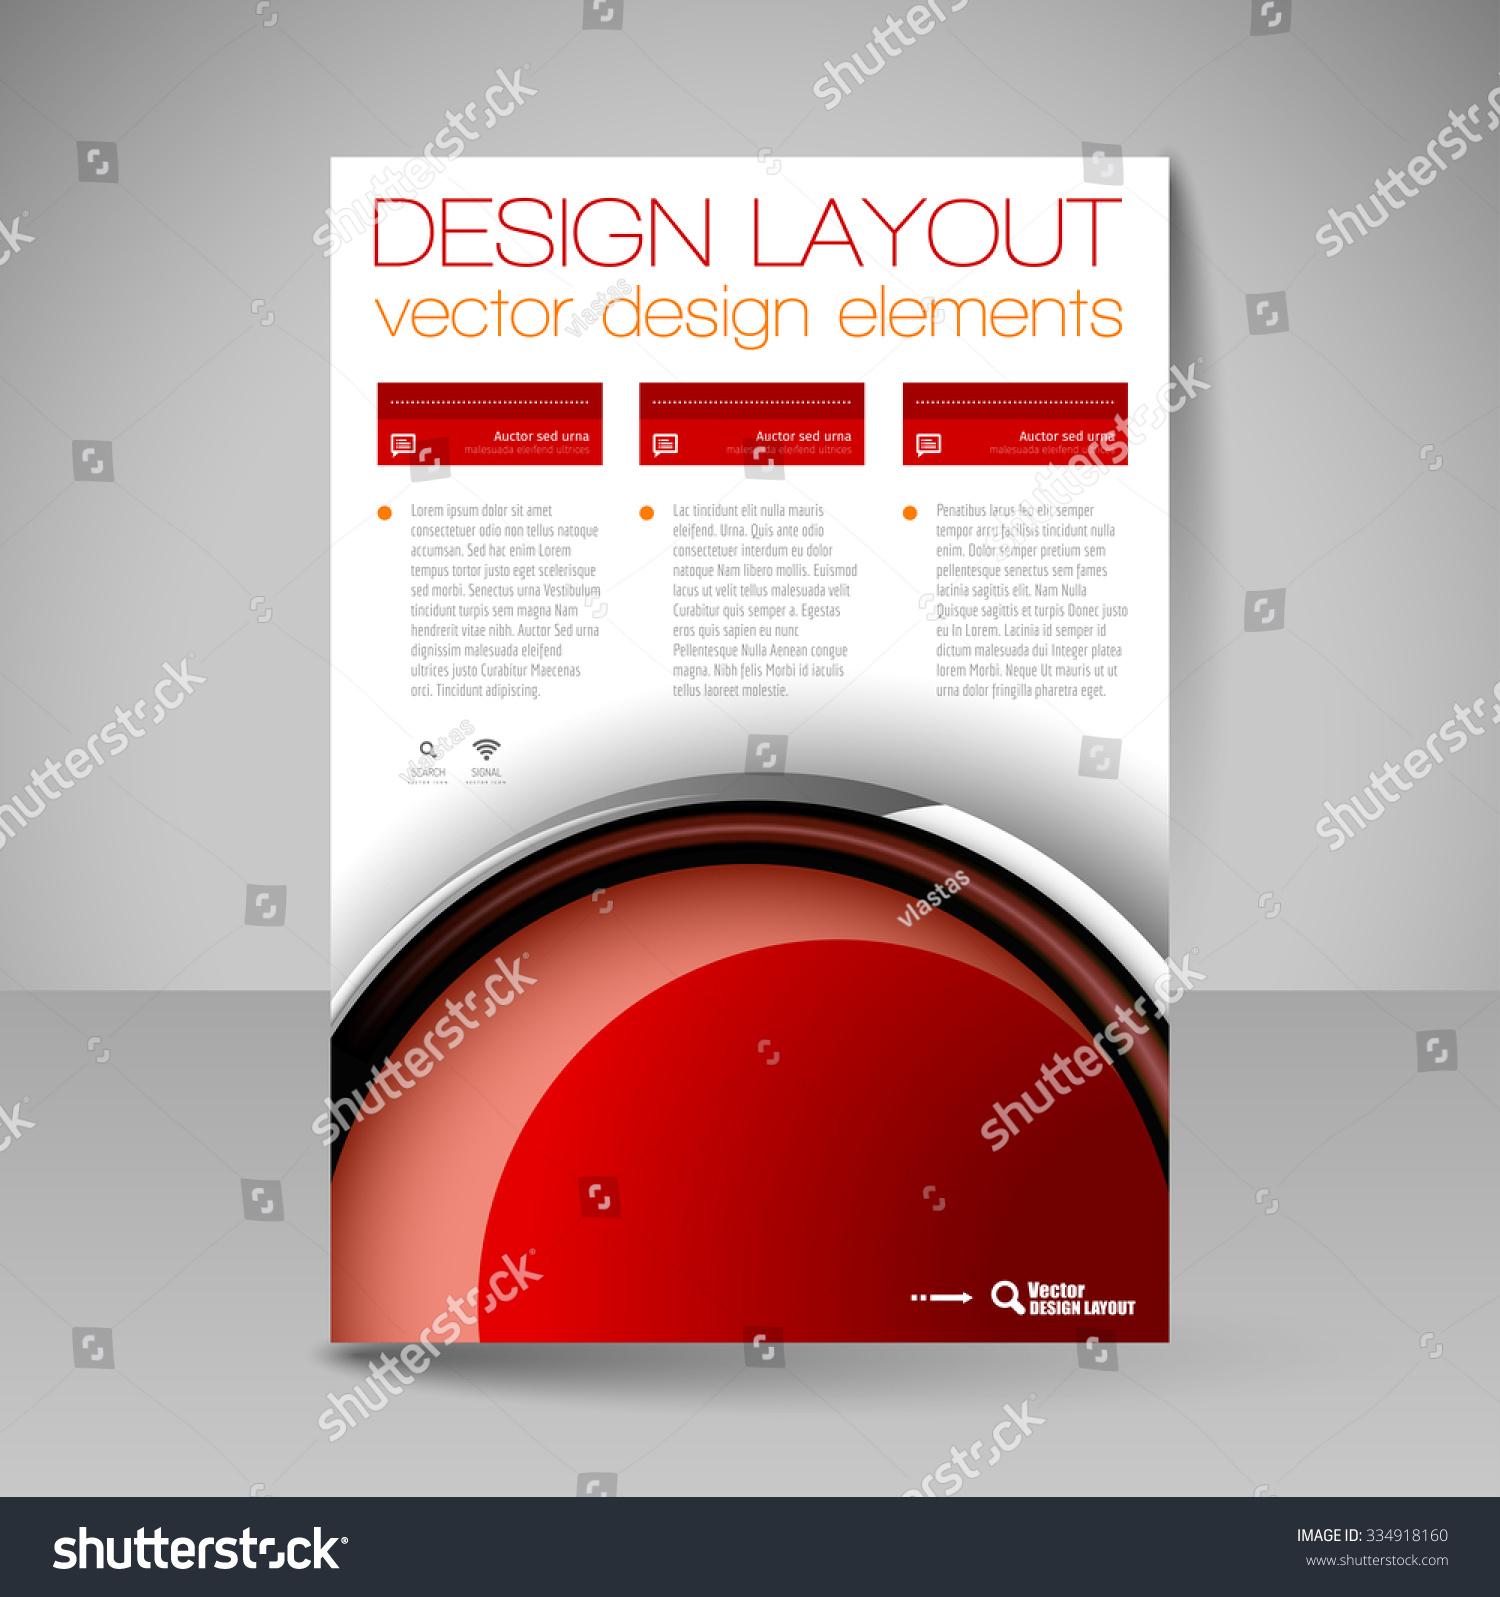 template brochure flyer editable site business stock vector 334918160 shutterstock. Black Bedroom Furniture Sets. Home Design Ideas